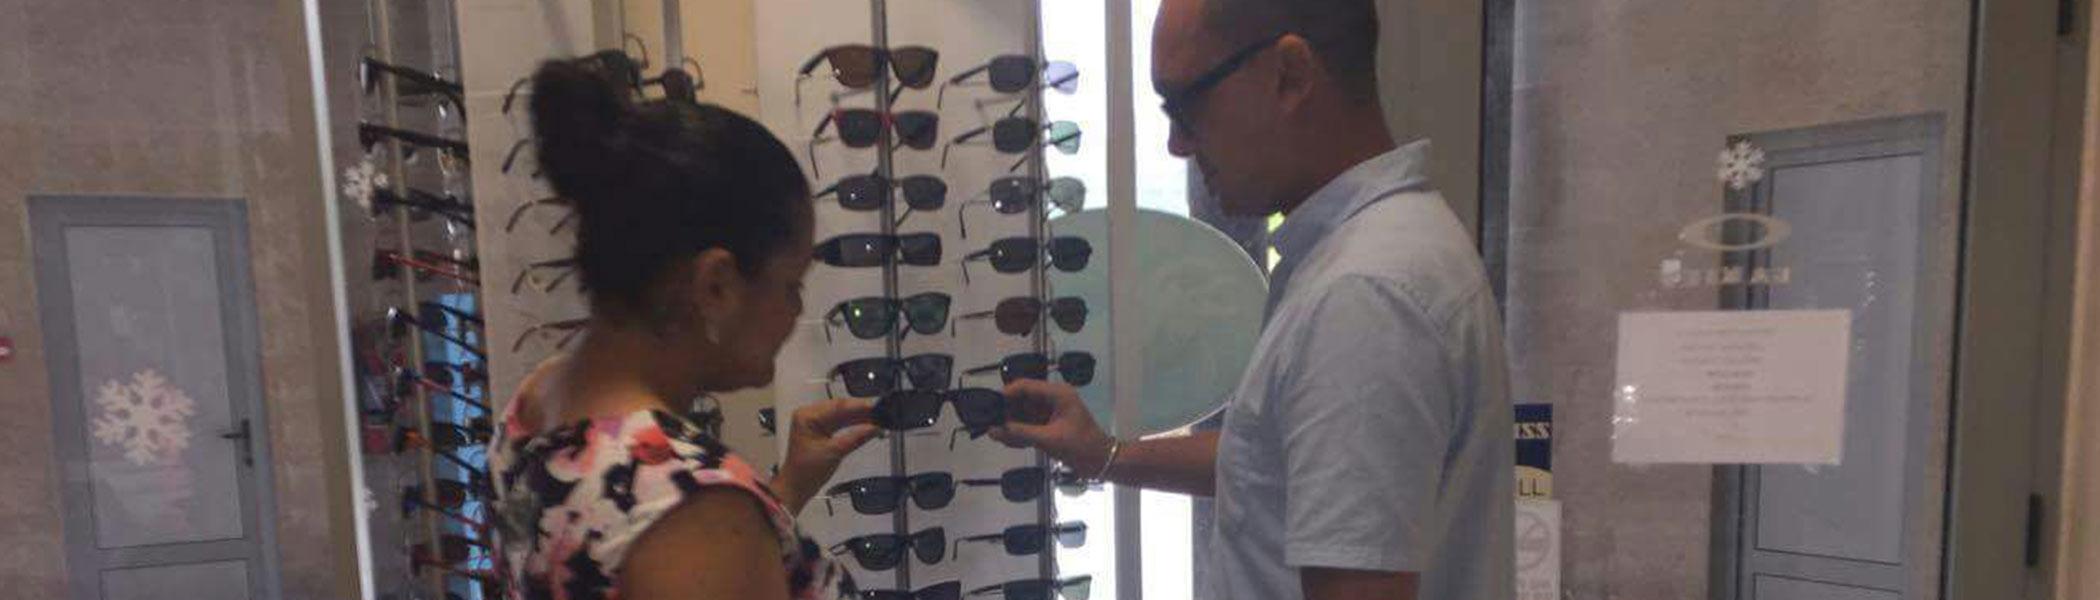 vision-care-grand-anse-praslin, Eye care in Seychelles Islands